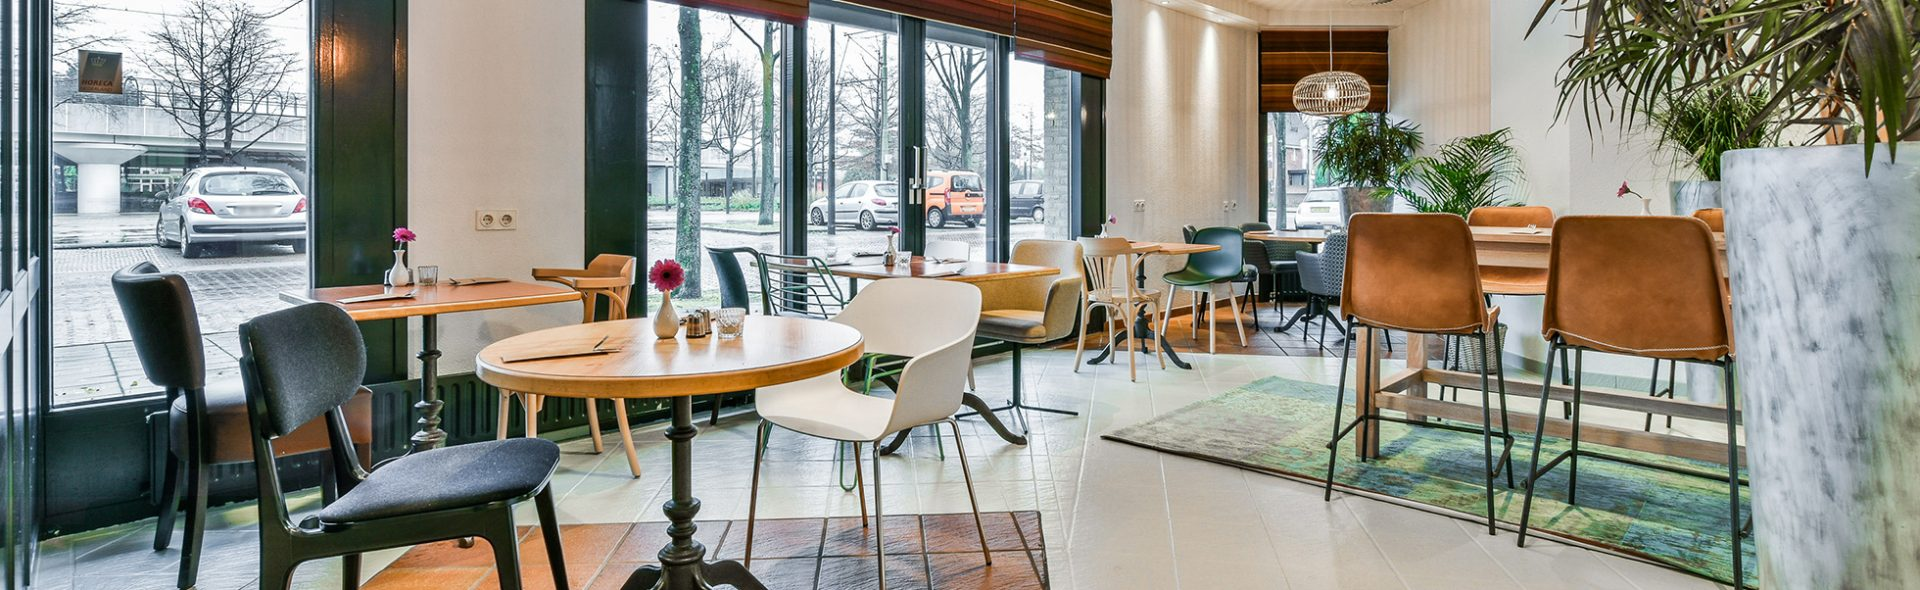 Hotel Den Haag-Voorburg: beganegrond na